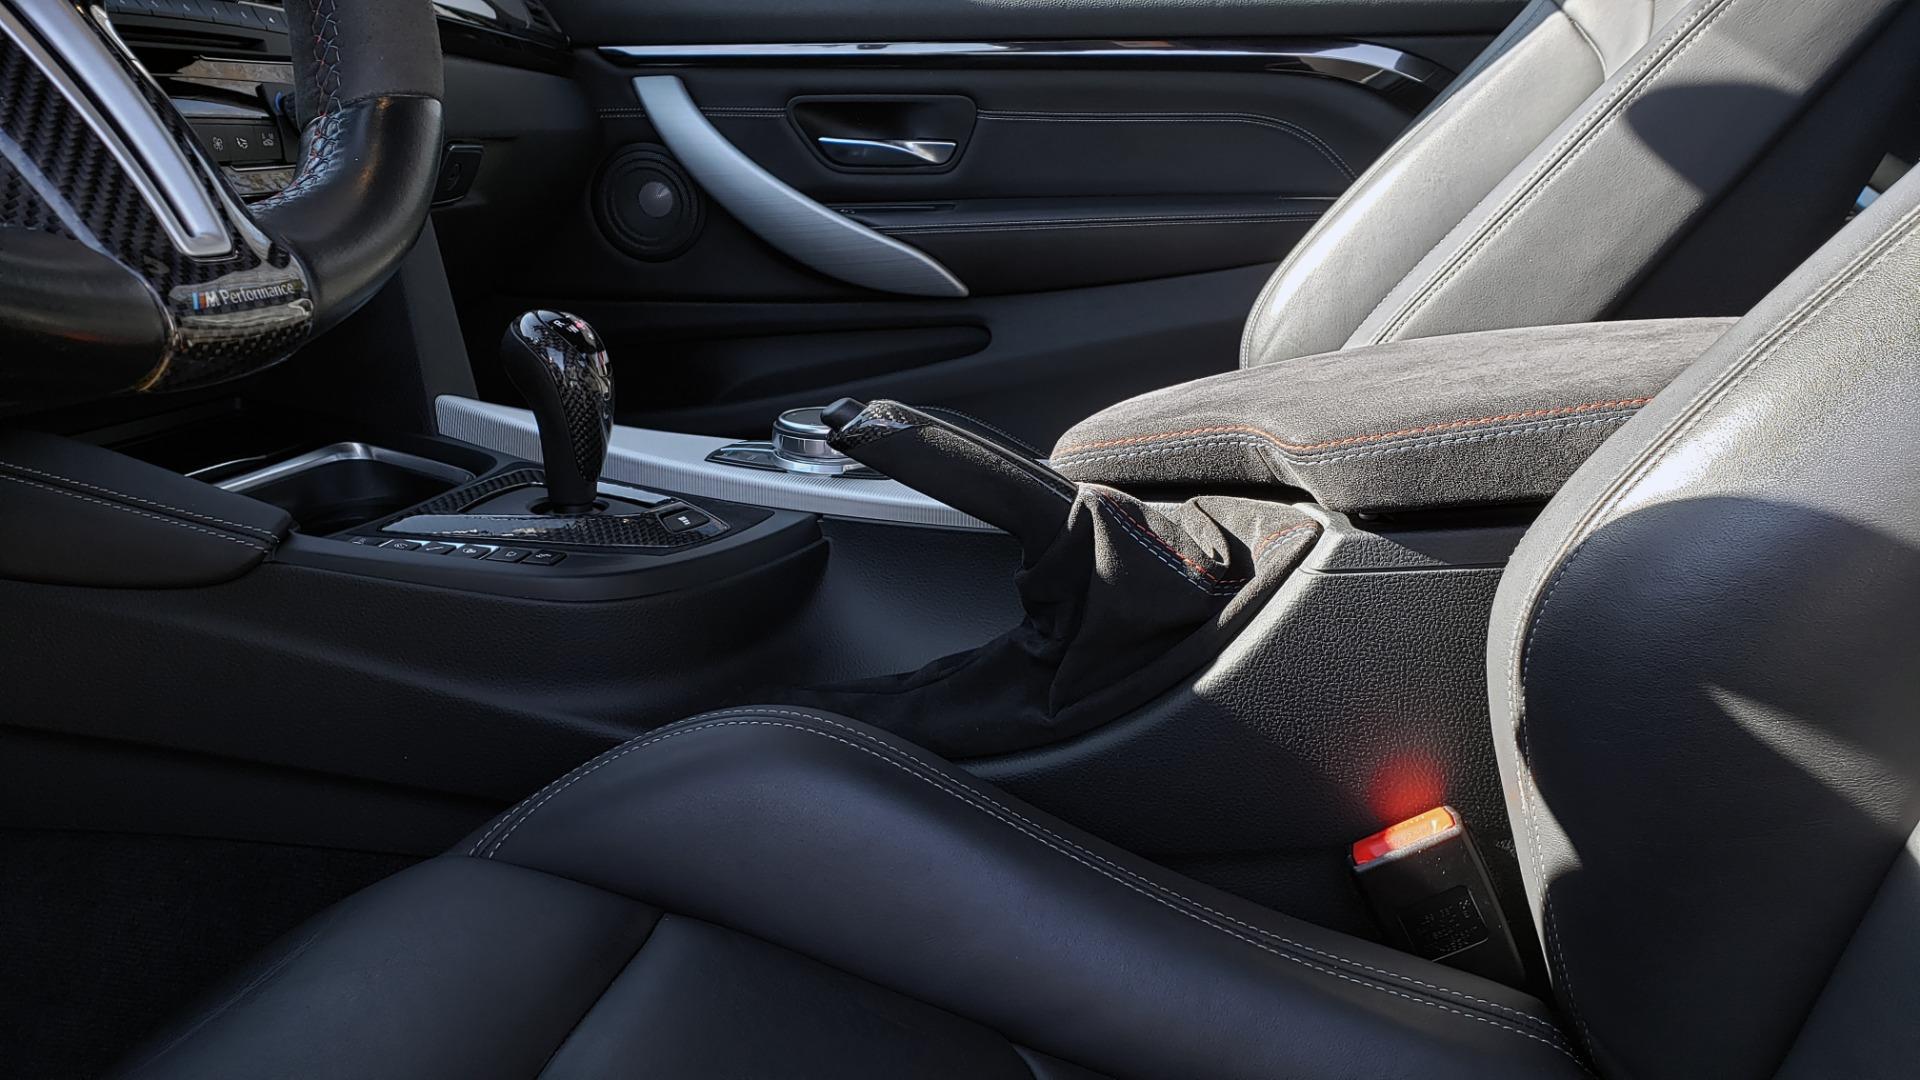 Used 2018 BMW M4 COMP PKG / EXEC / M-DRIVER / PARK CNTRL / ACTIVE BLIND SPOT for sale $45,449 at Formula Imports in Charlotte NC 28227 51